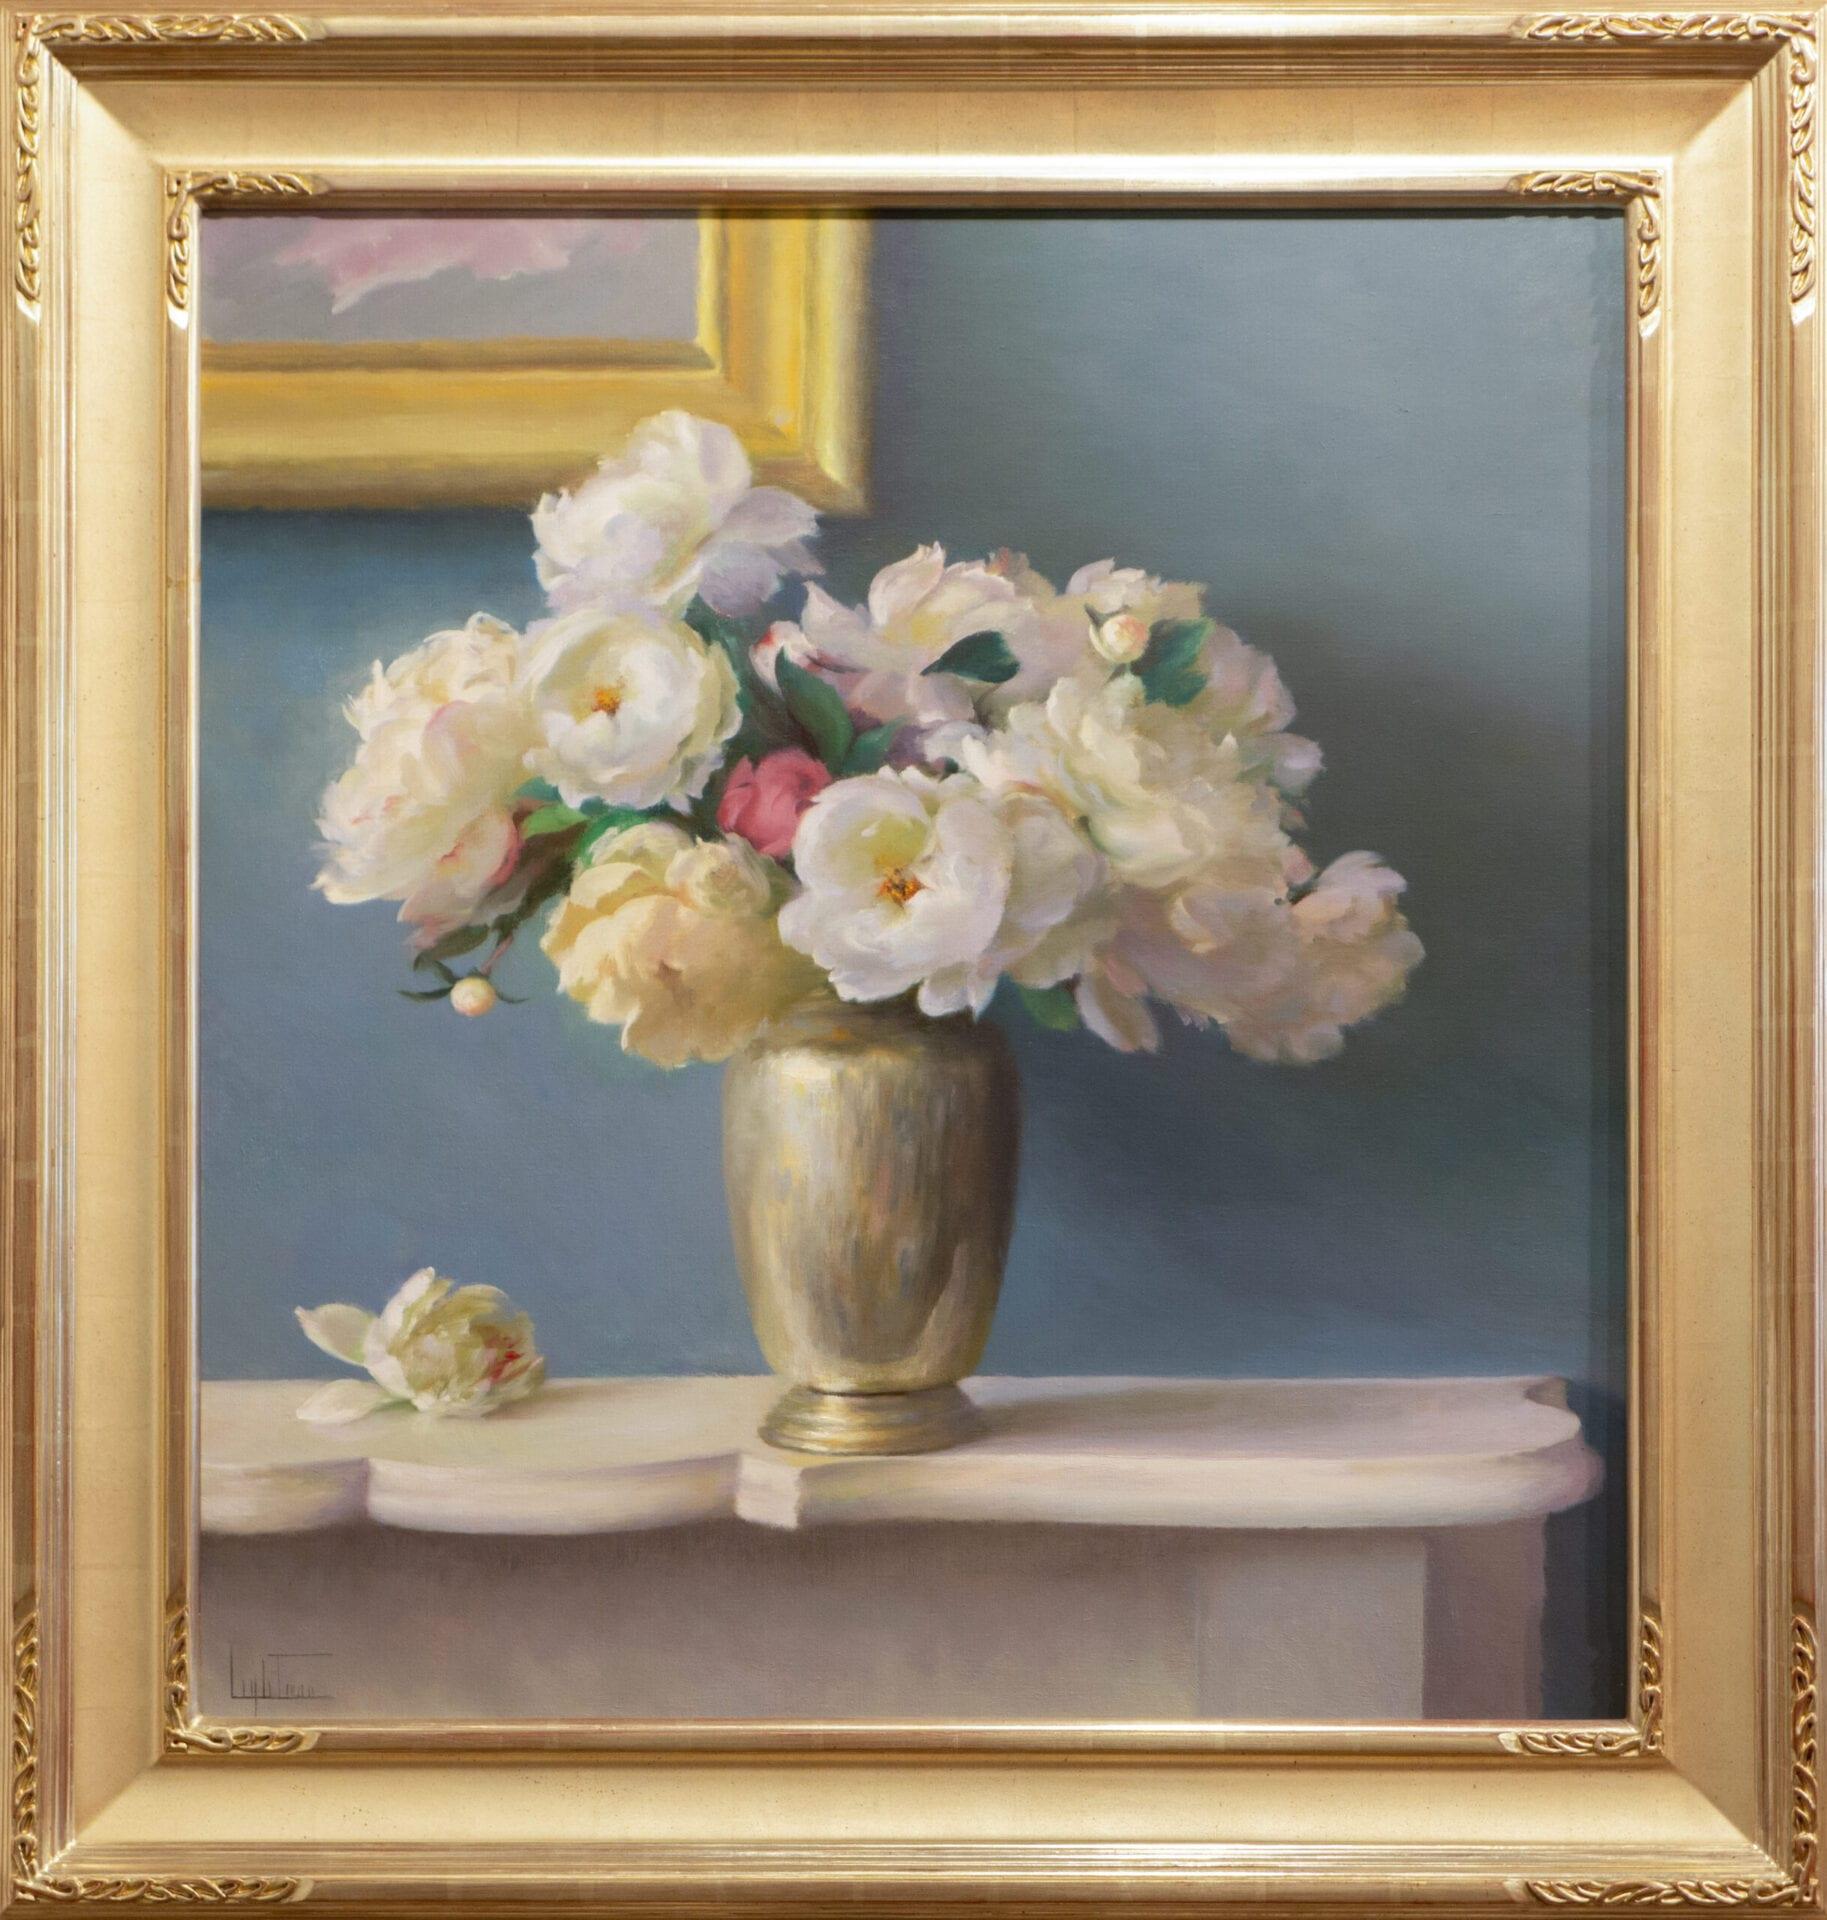 "Arrangement on the Mantel | Jean Lightman | Oil on Canvas | 34.75 x 33"""